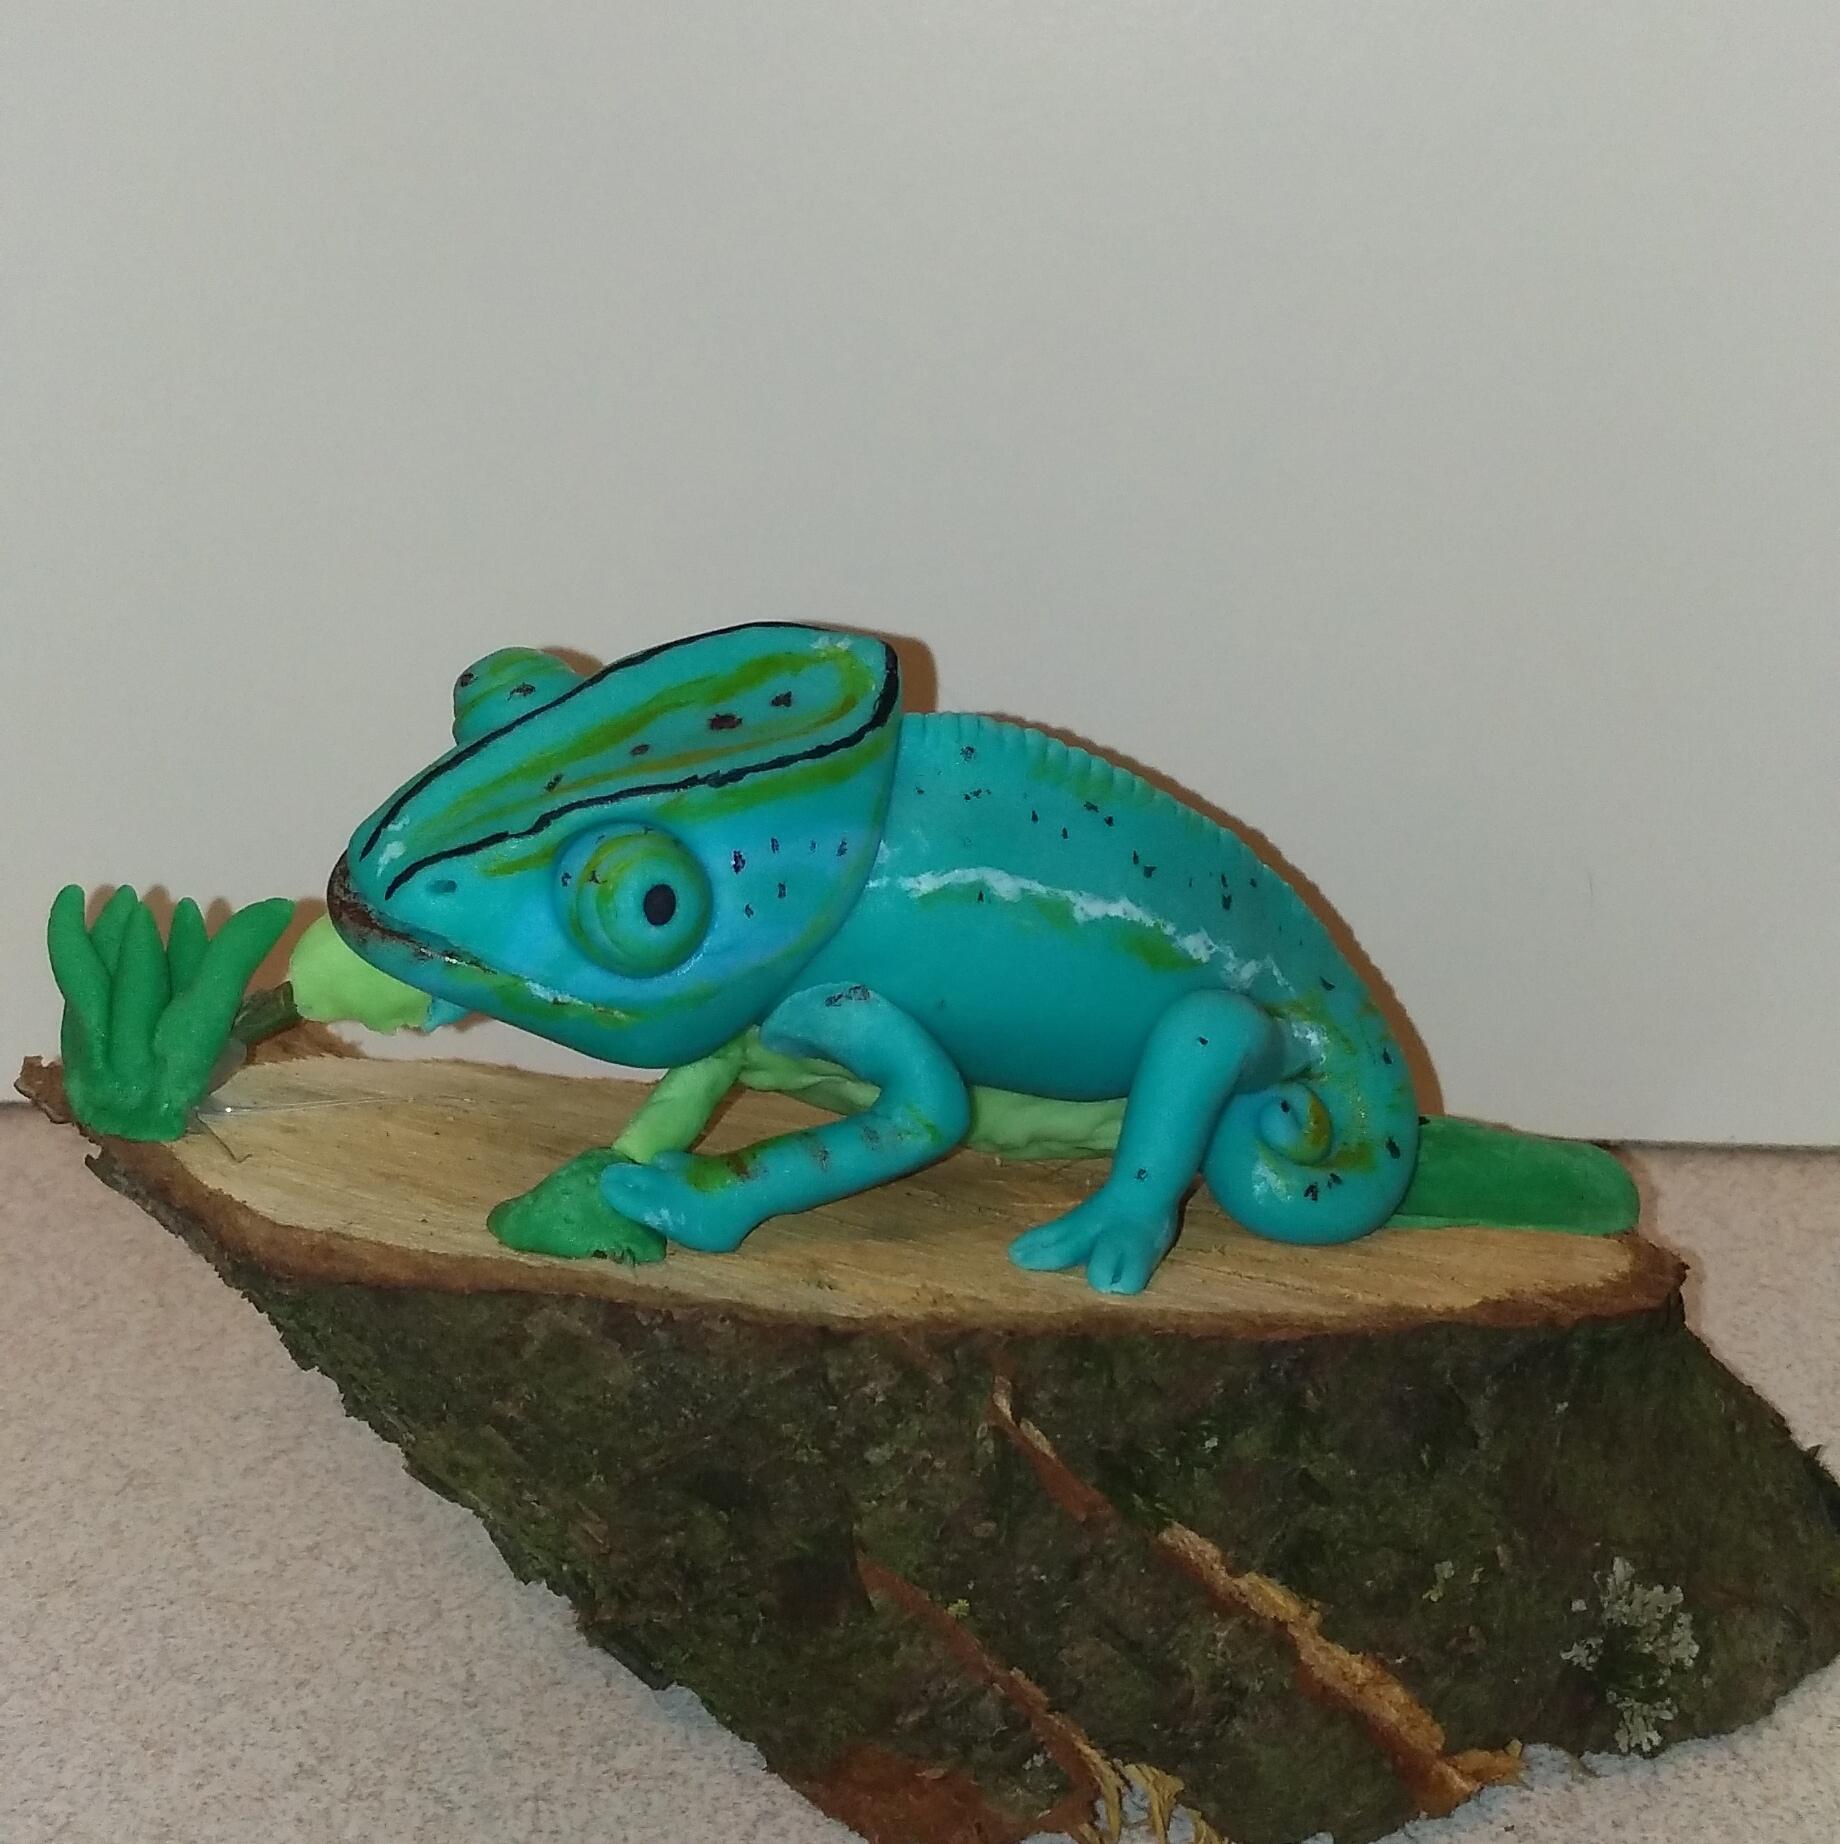 Chameleon by Elisabeth Petri